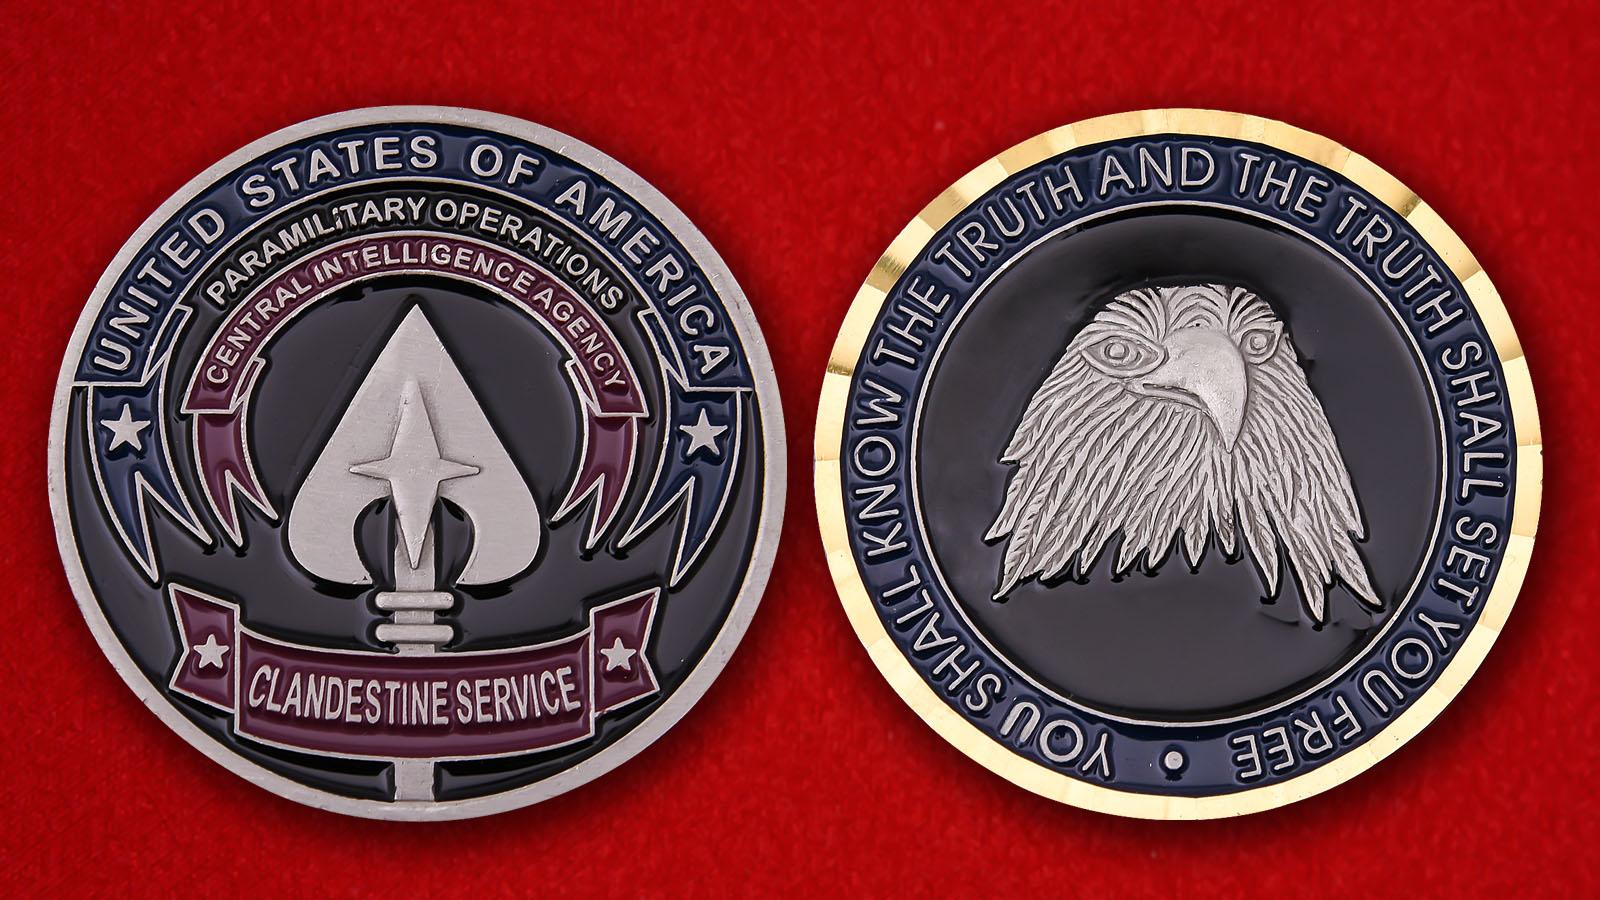 Clandestine service CIA Challenge Coin - obverse and reverse